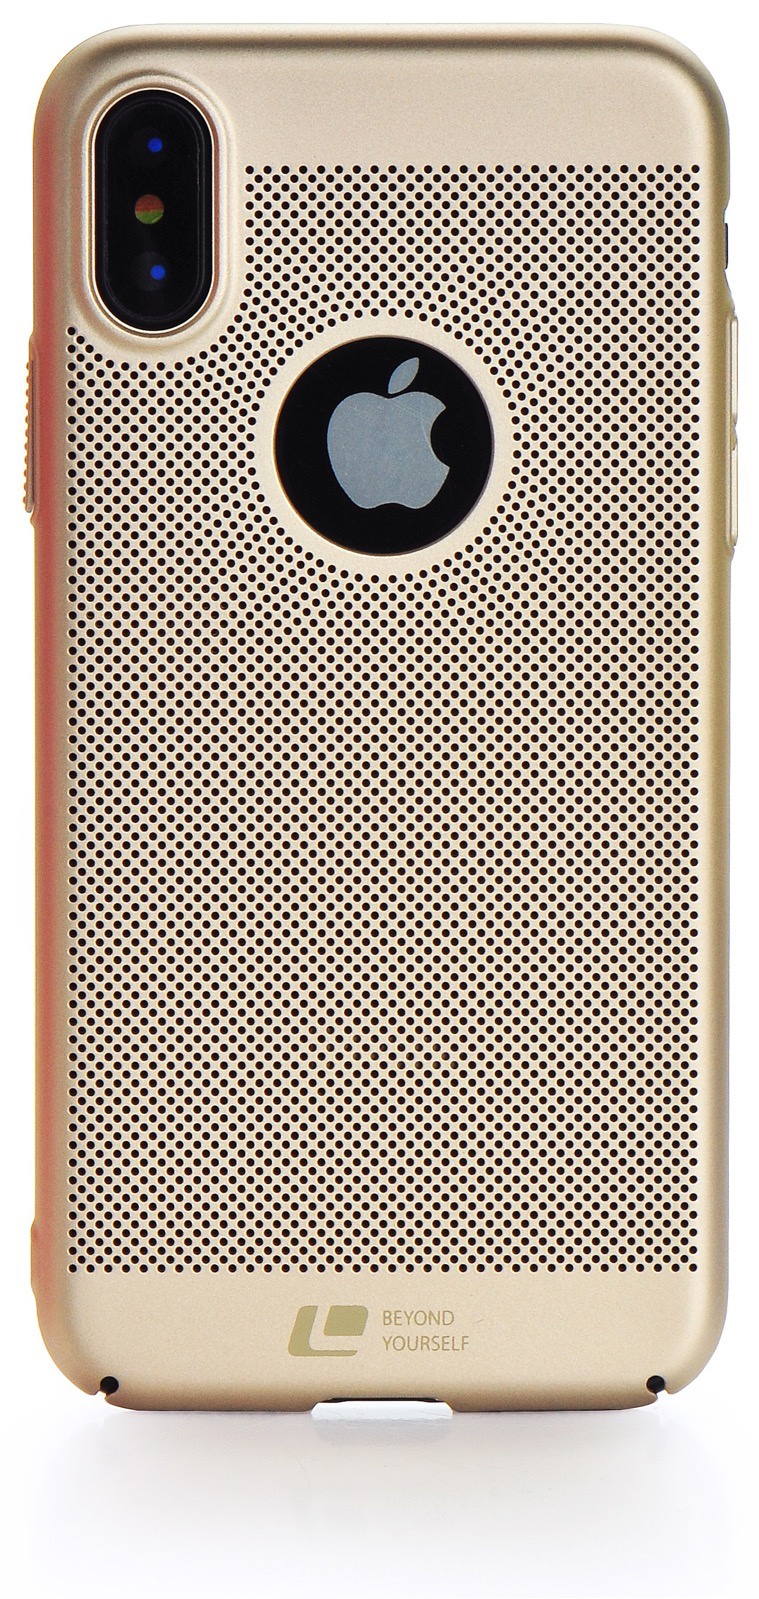 Чехол для сотового телефона Loopee Brathe Series накладка пластик с вырезом для Apple iPhone X/XS 5.8